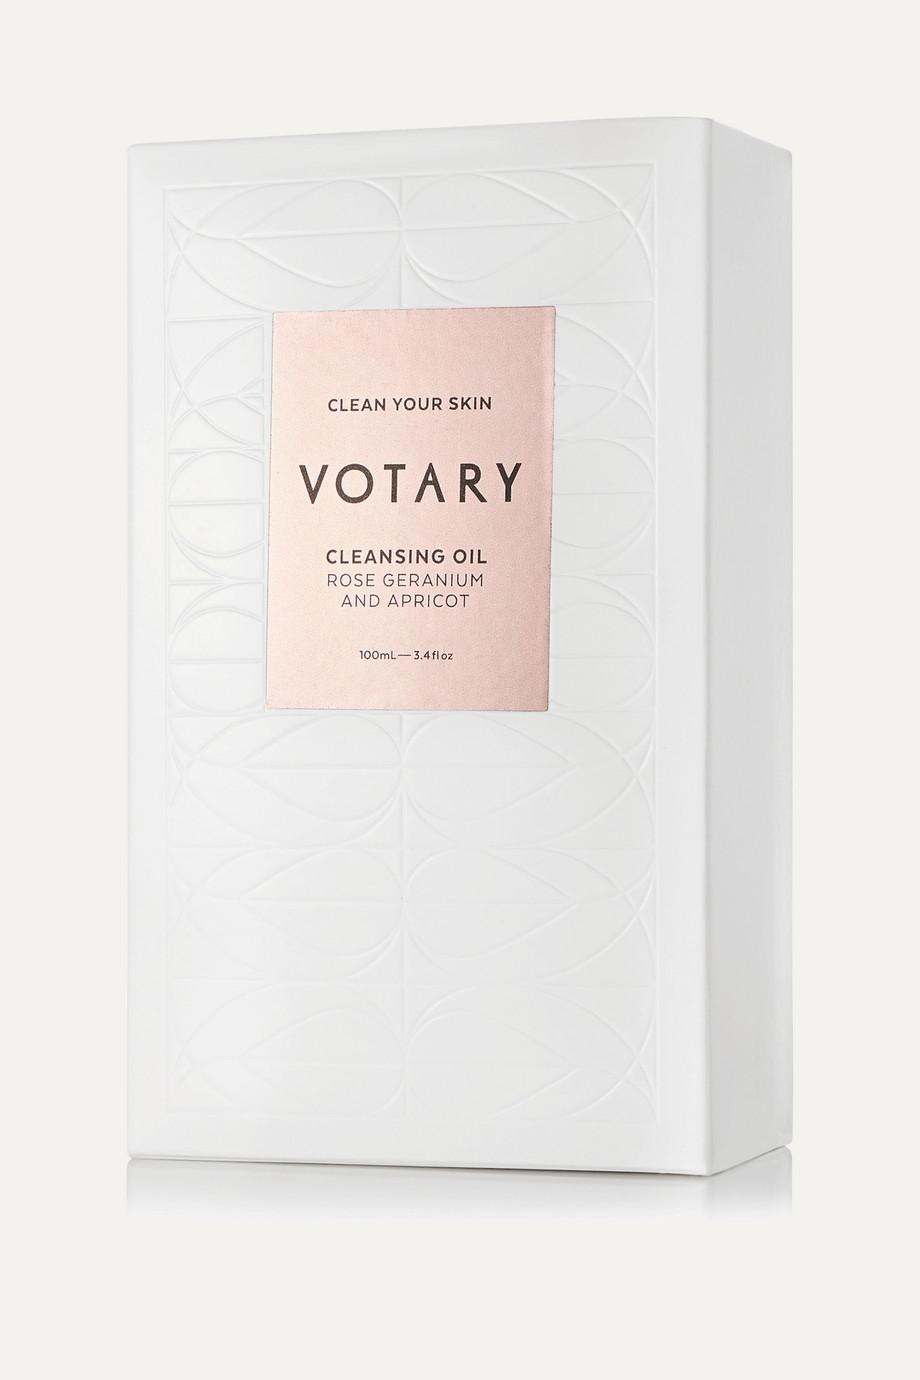 Votary Cleansing Oil – Rose Geranium & Apricot, 100 ml – Reinigungsöl